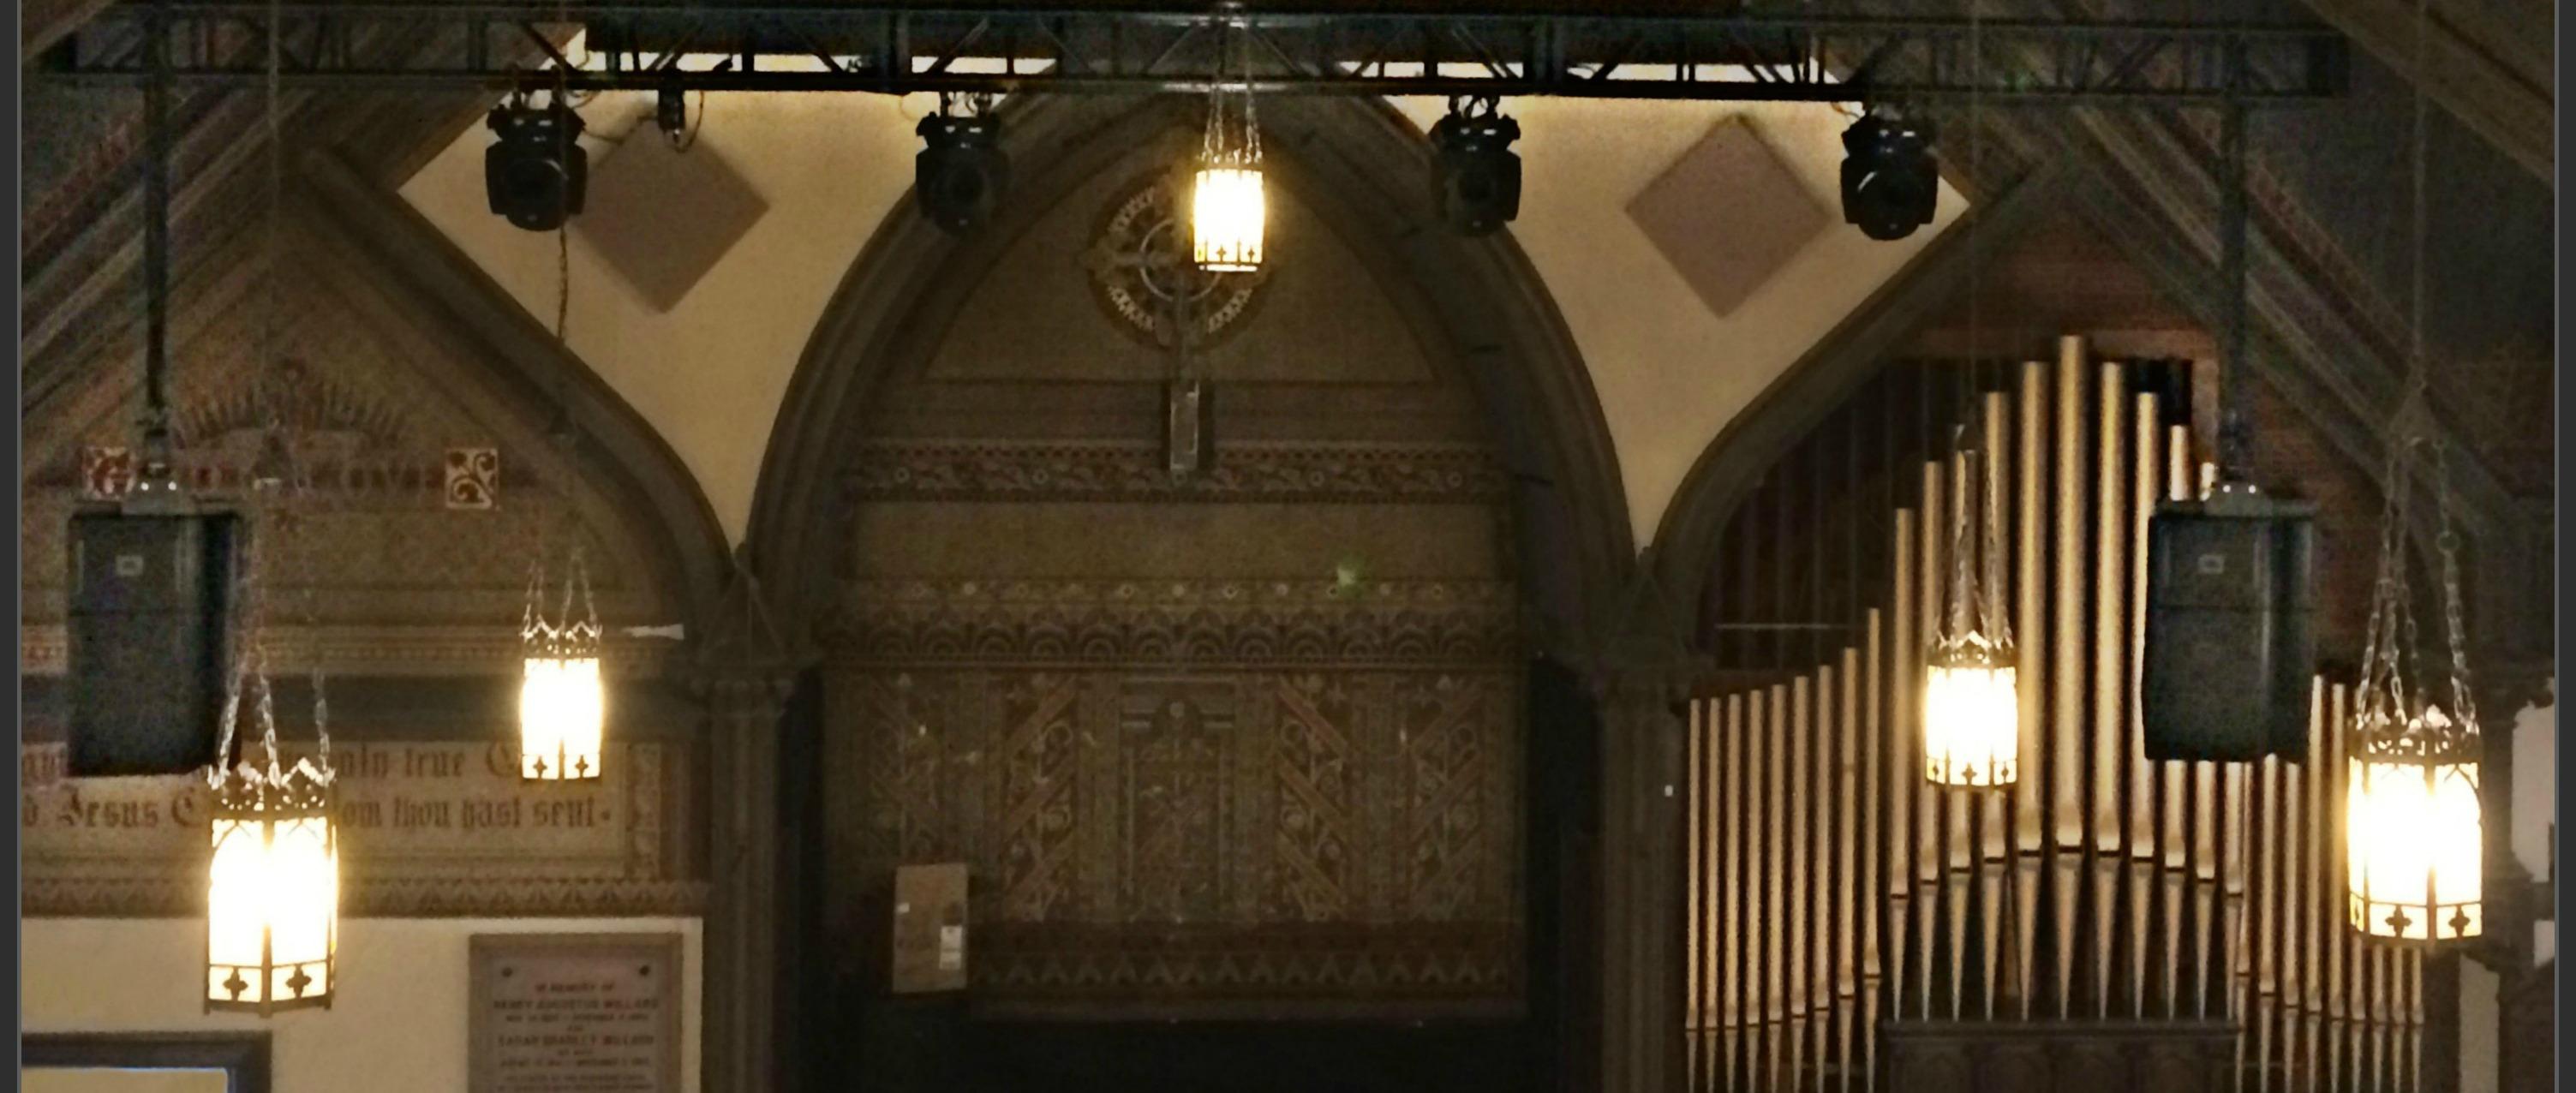 The Stone Church – Brattleboro, VT